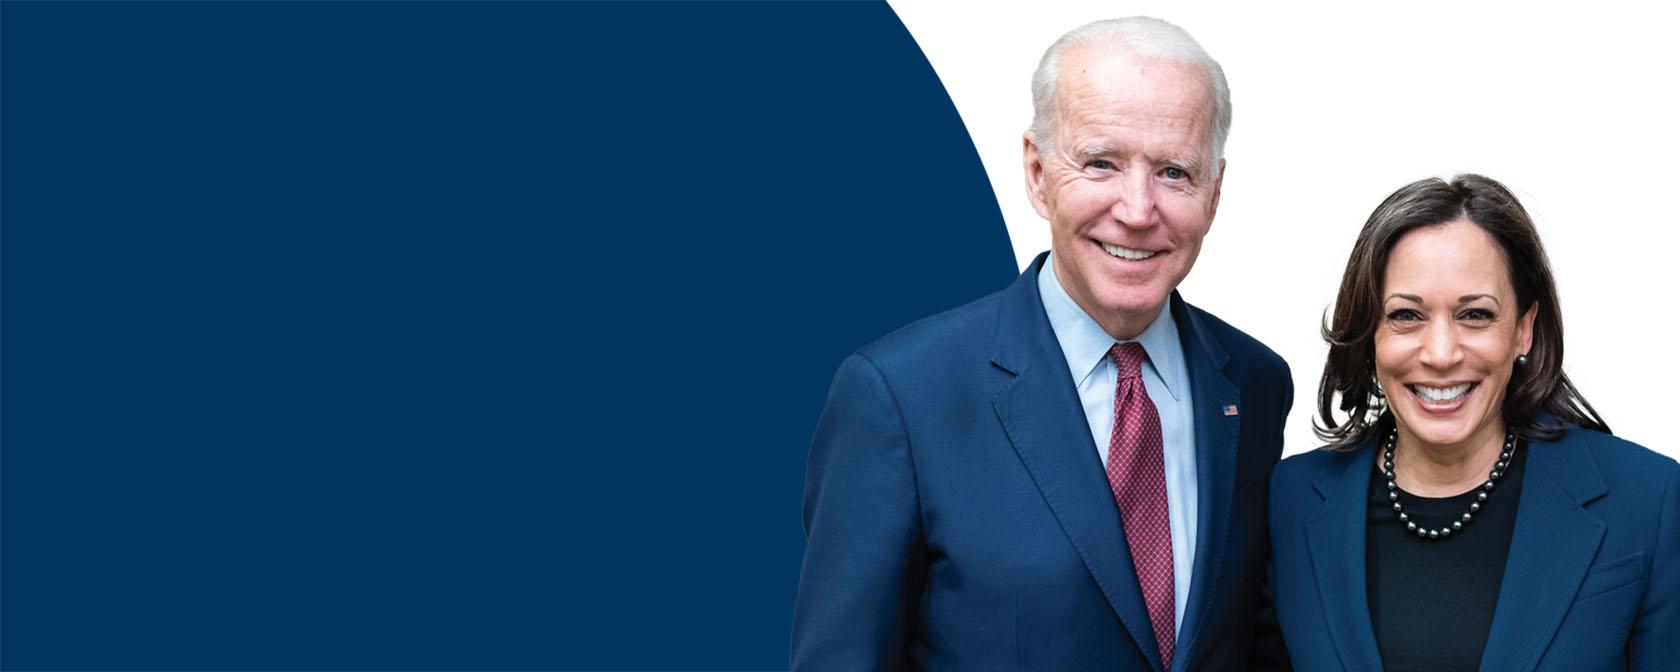 Endorsing Joe Biden And Kamala Harris For The Animals Hslf